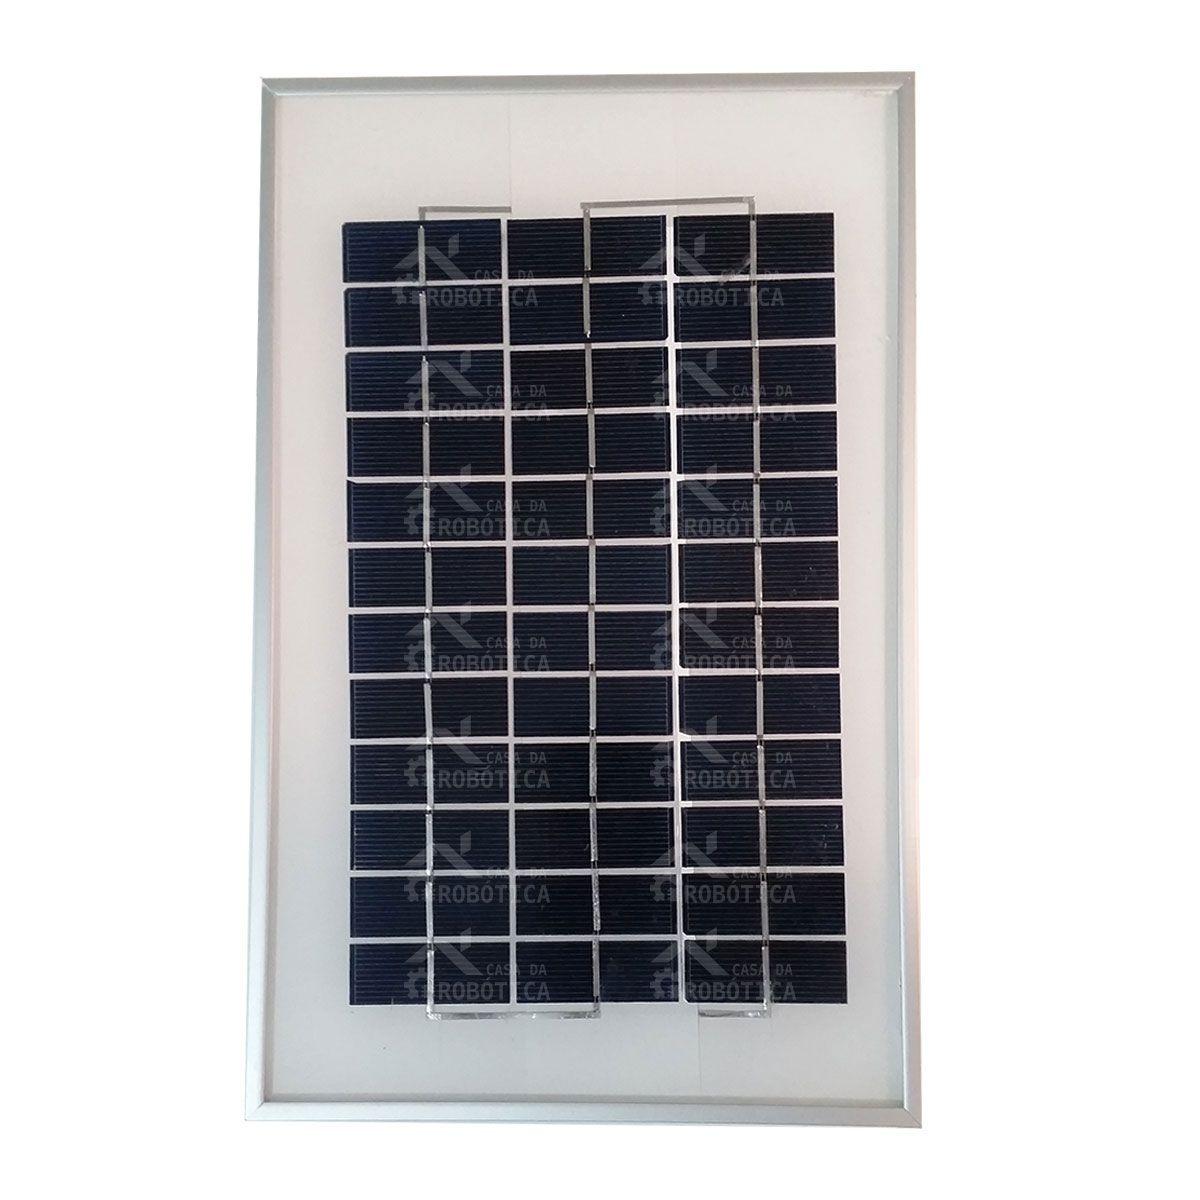 Painel / Placa / Célula de Energia Solar Fotovoltaica 5W